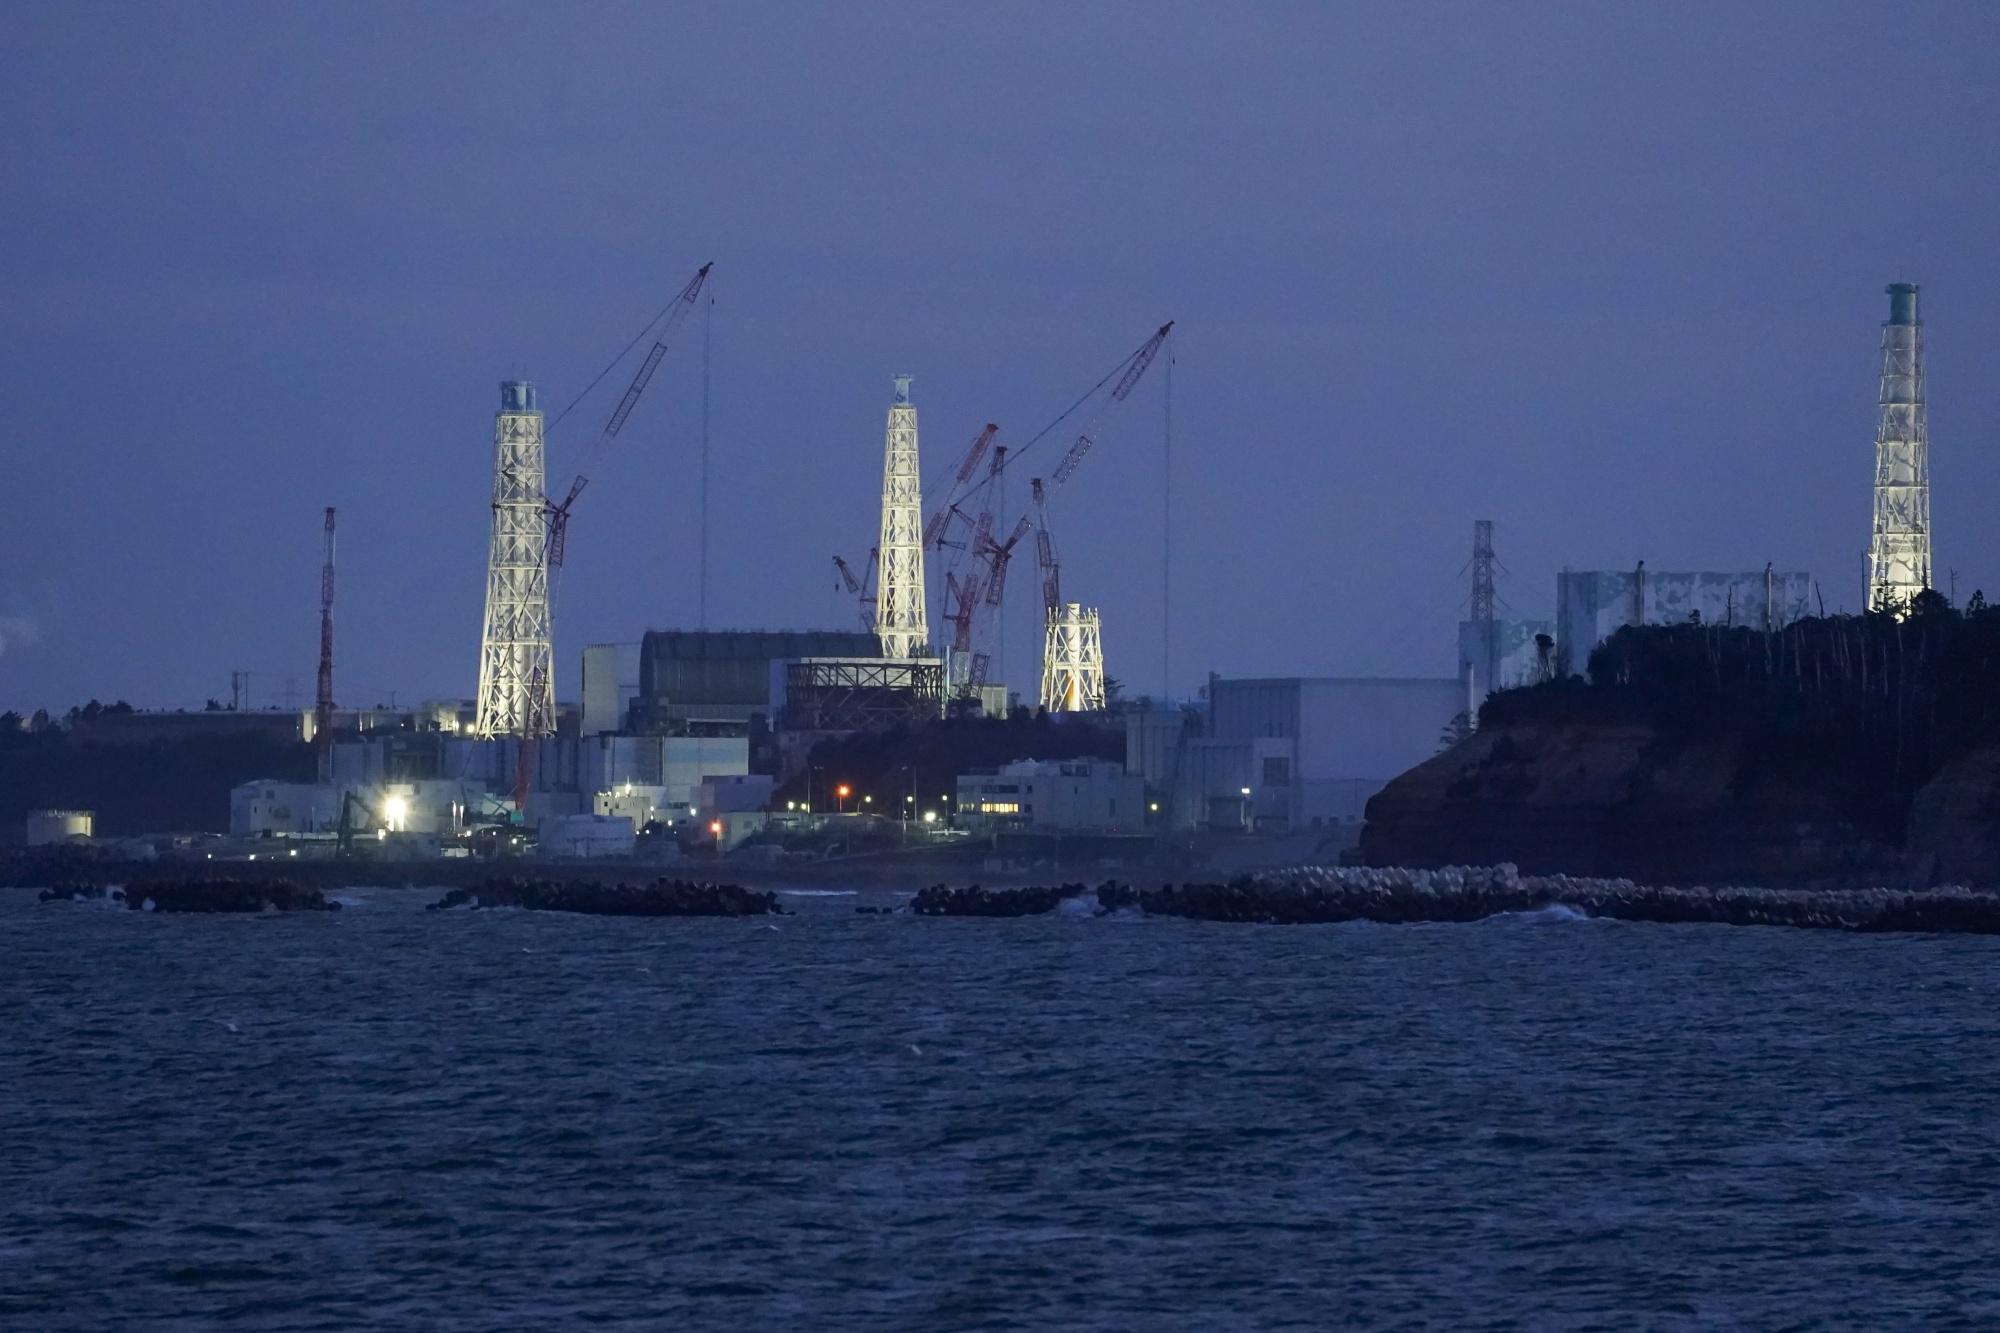 The Fukushima Dai-Ichi nuclear power plant.